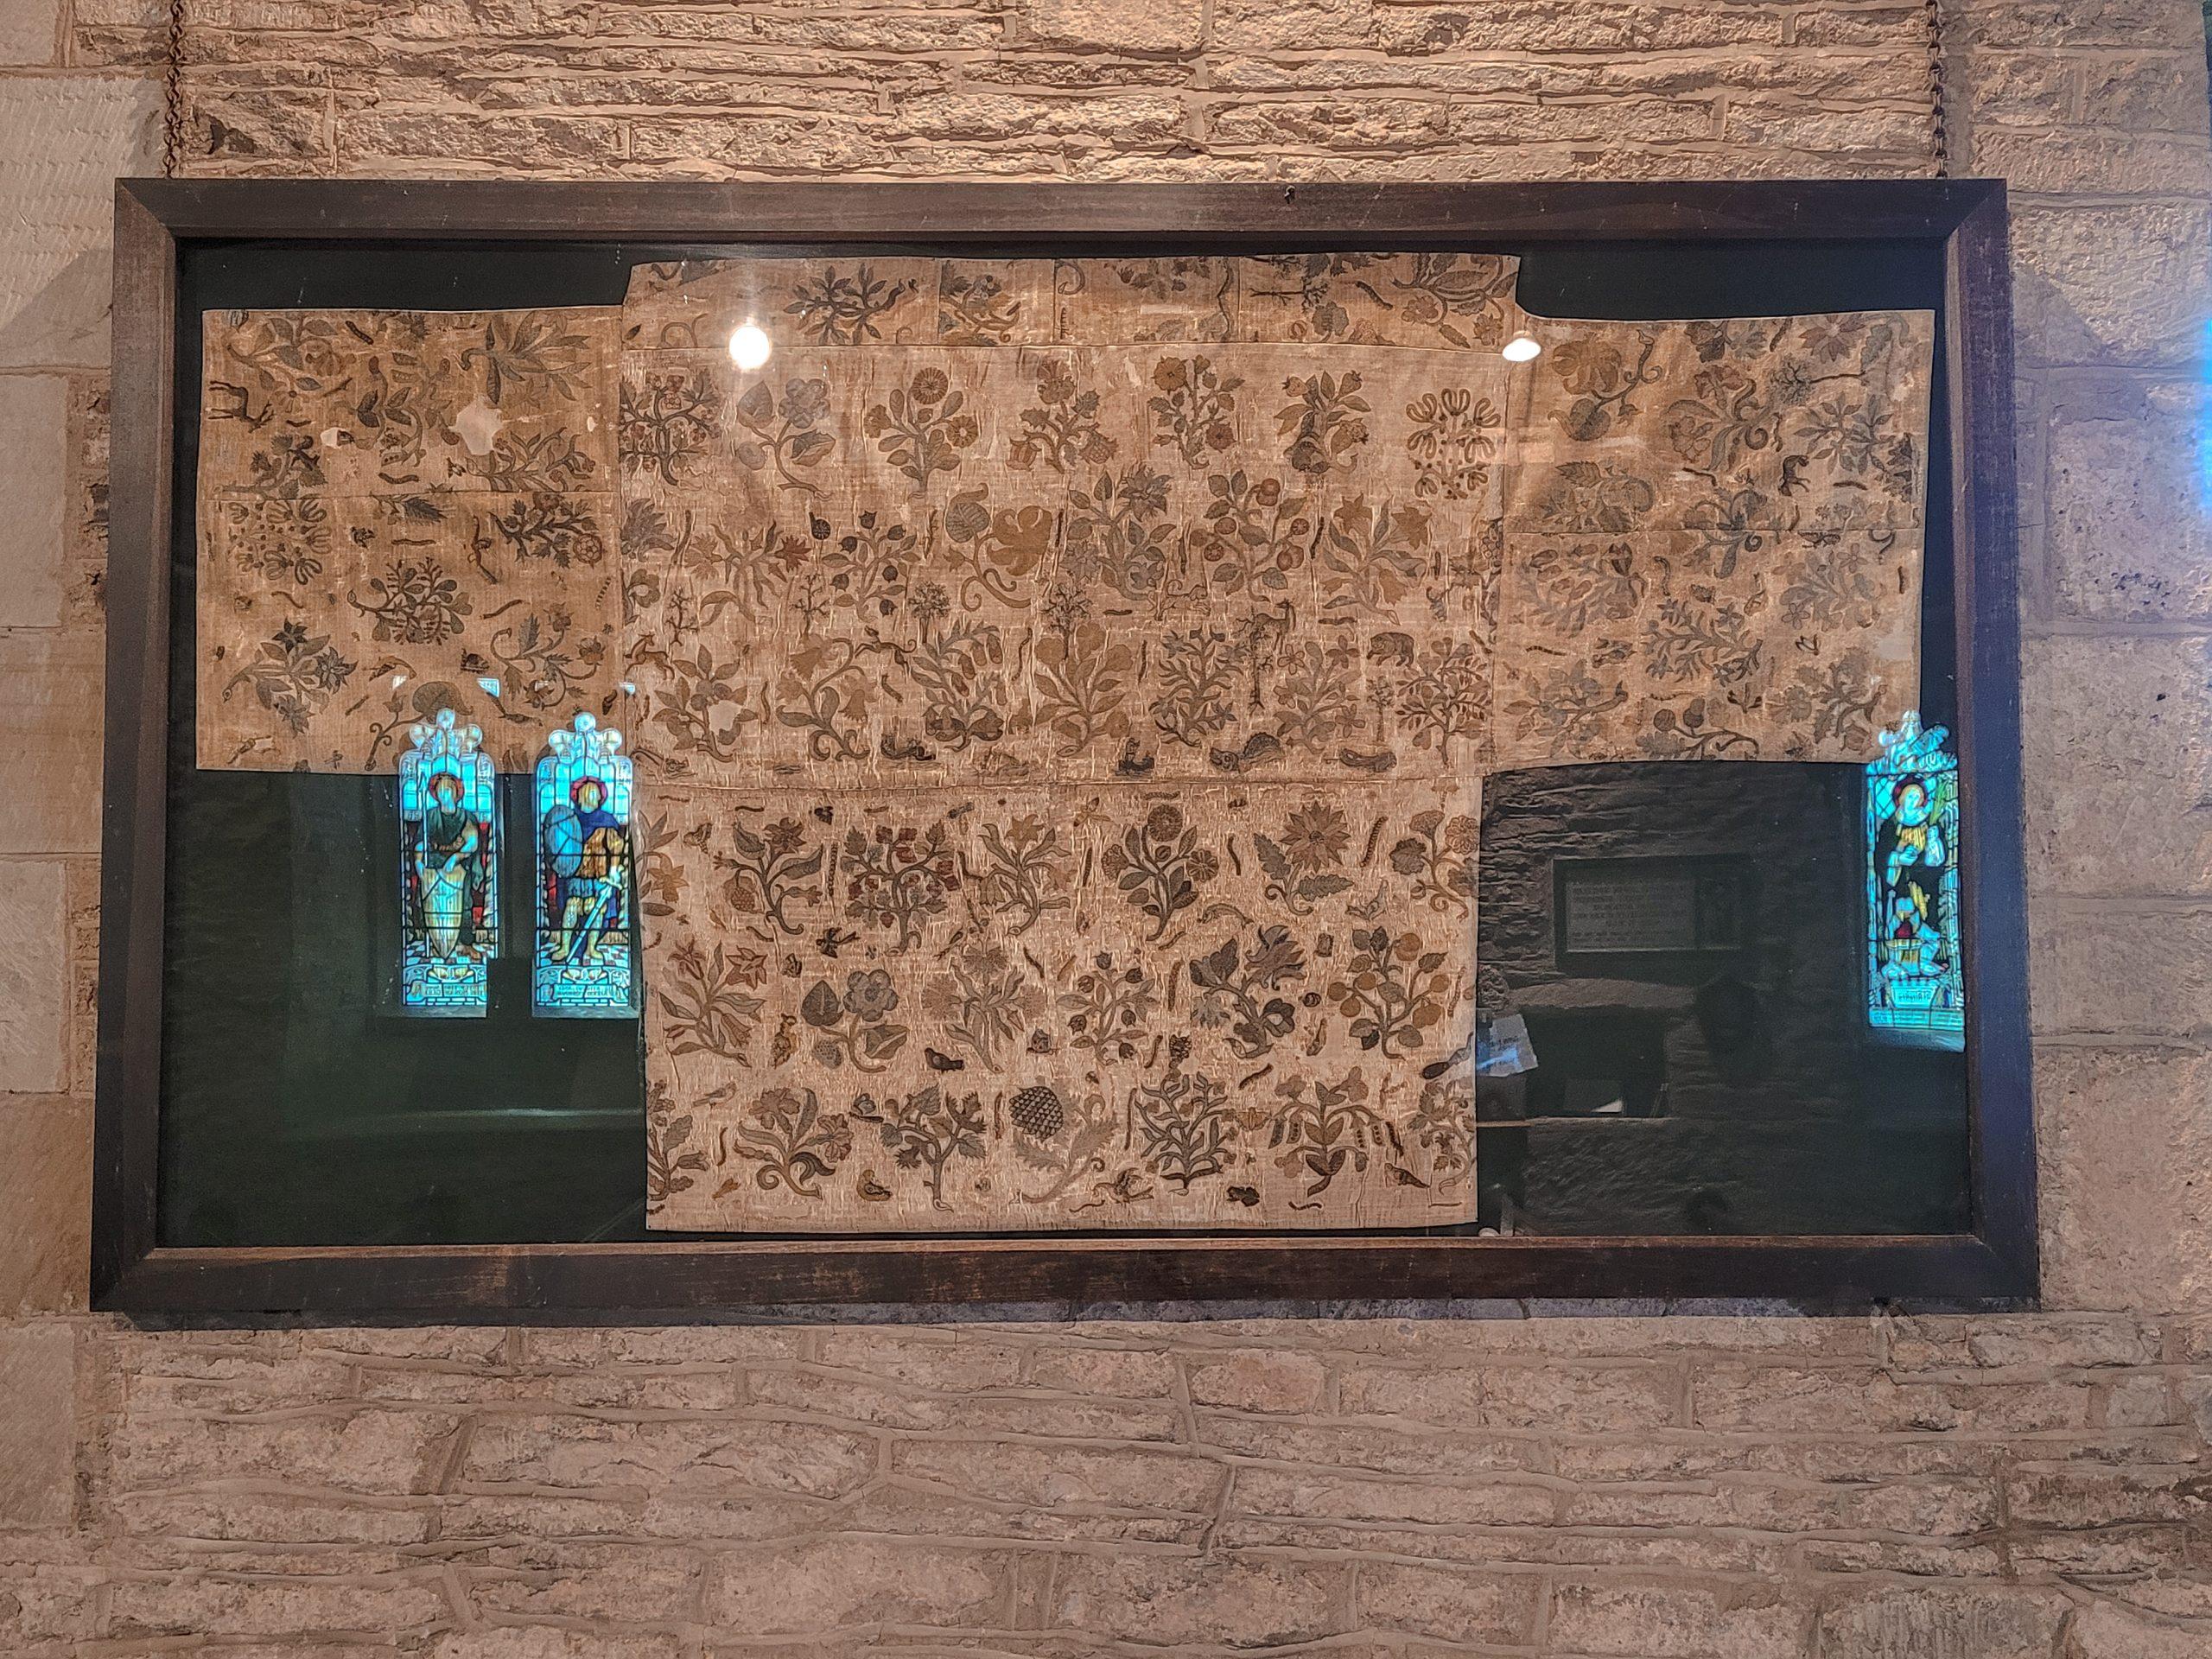 Bacton Altar Cloth replica